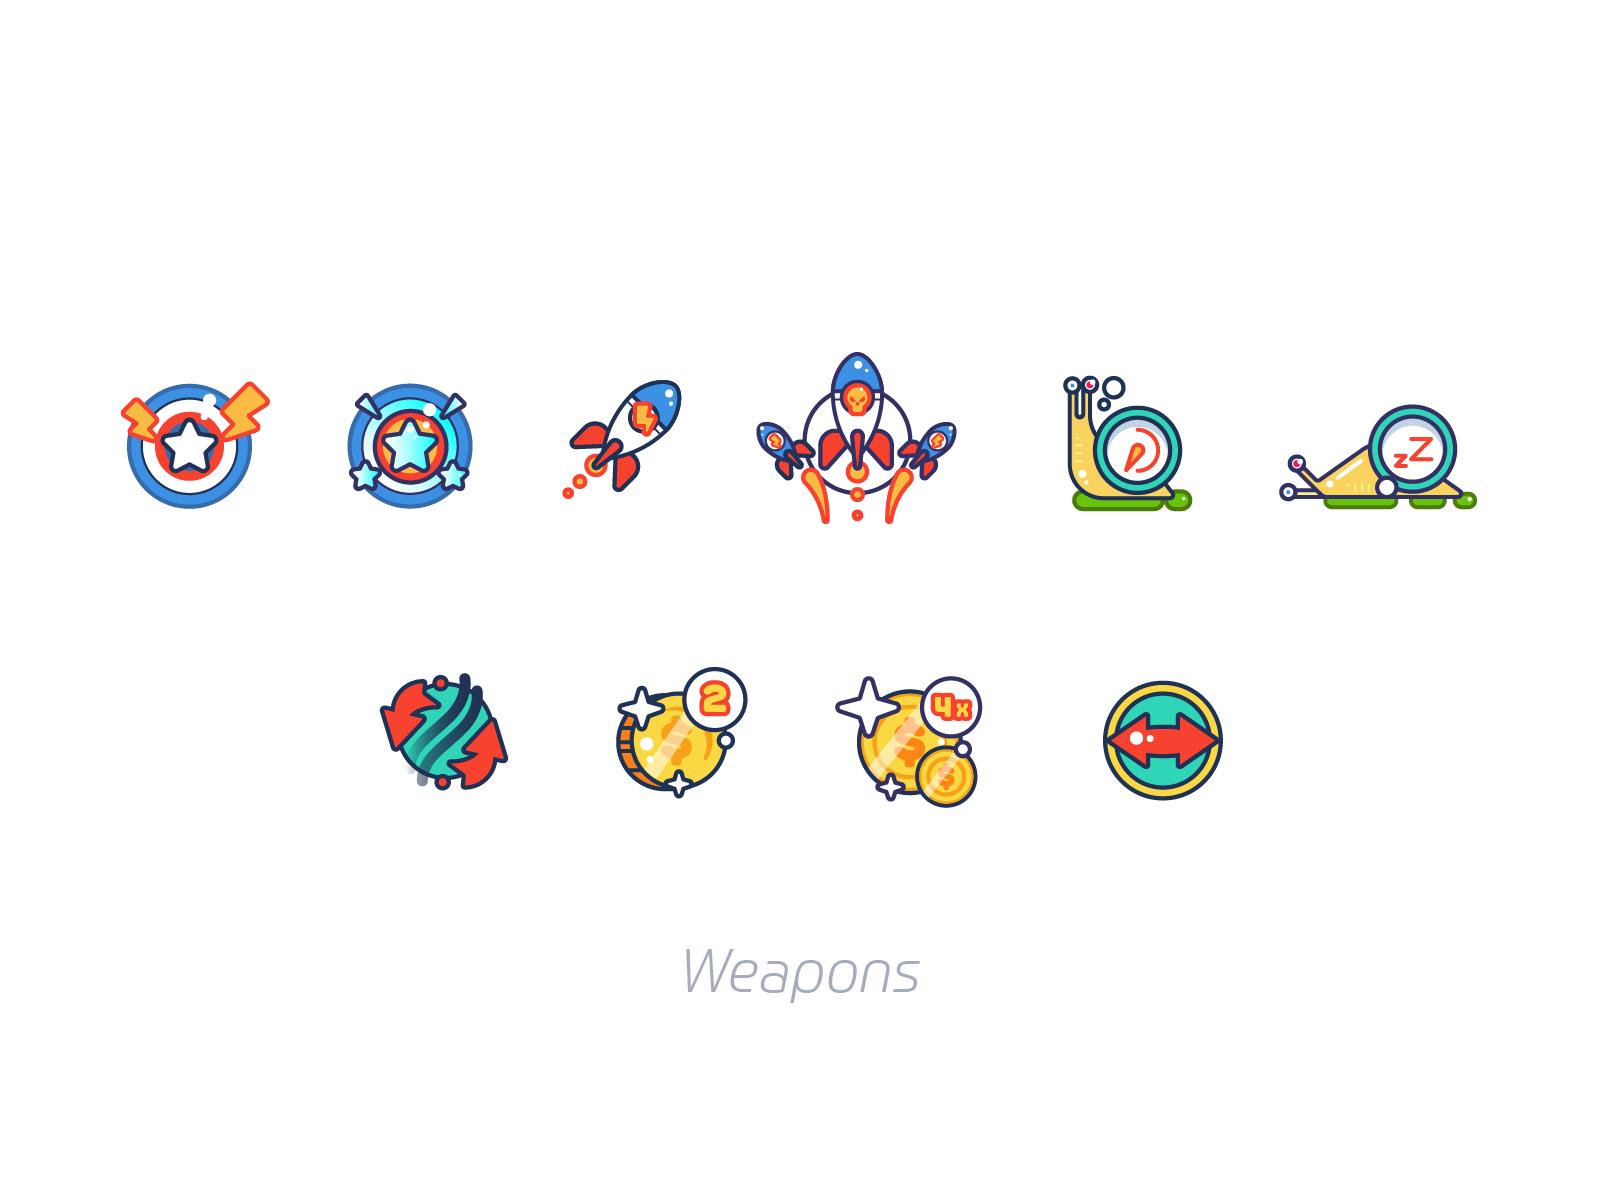 weapons game design illustration